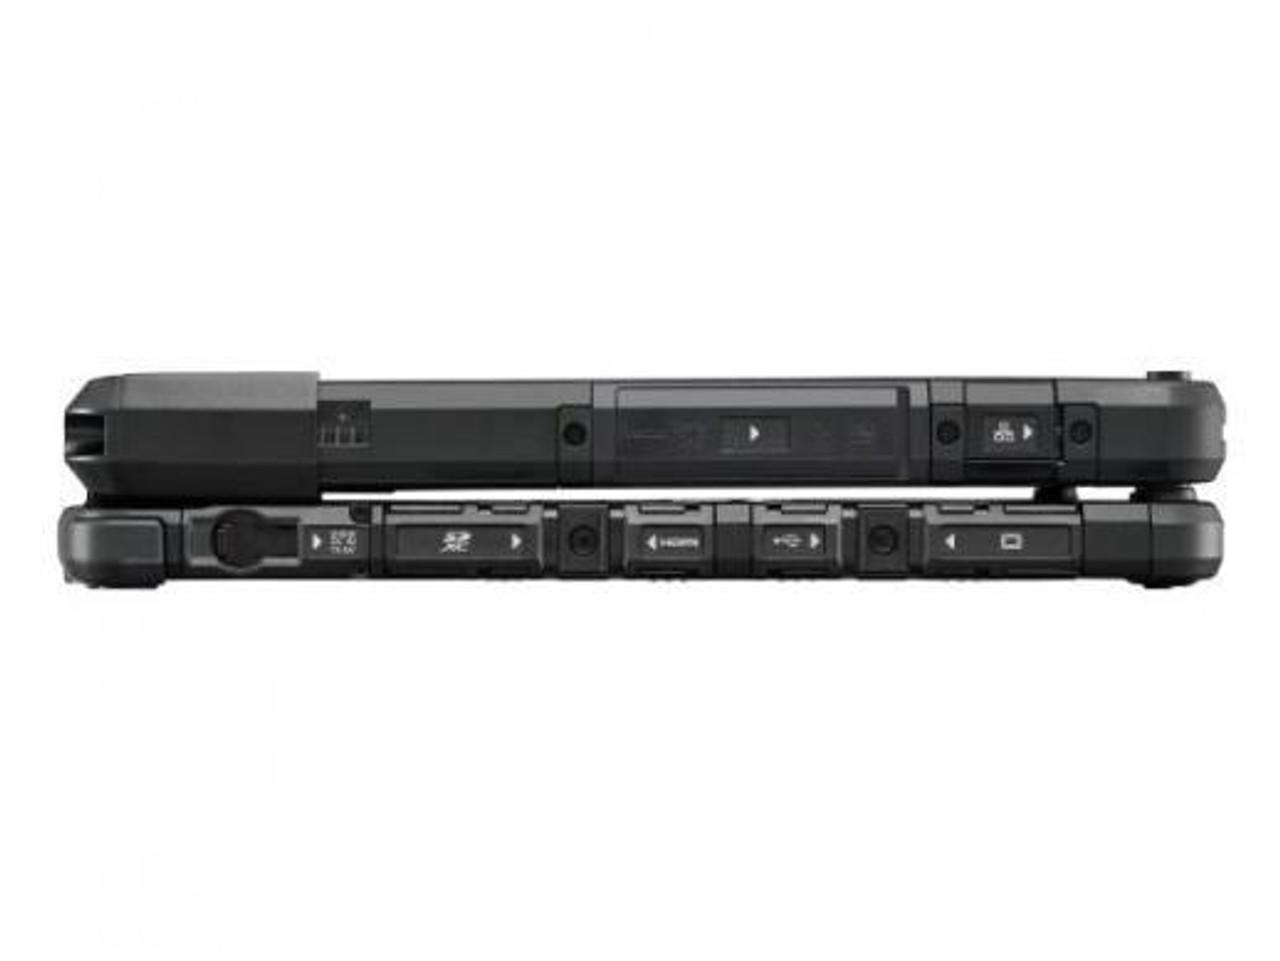 Panasonic CF-33 MK1 side 1